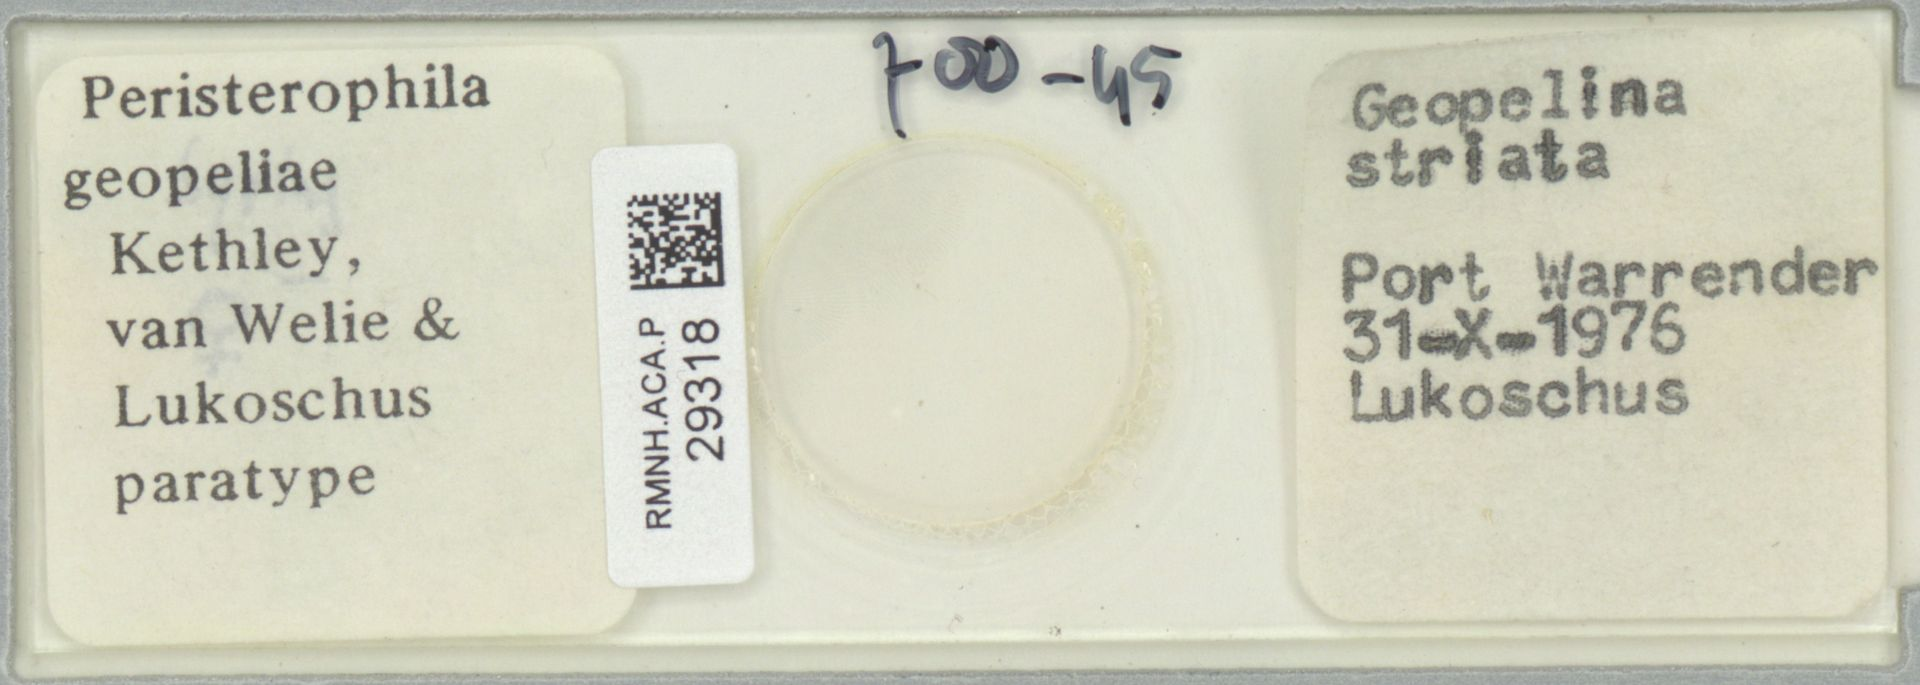 RMNH.ACA.P.29318 | Peristerophila geopeliae Kethley; van Weliy & Lukoschus